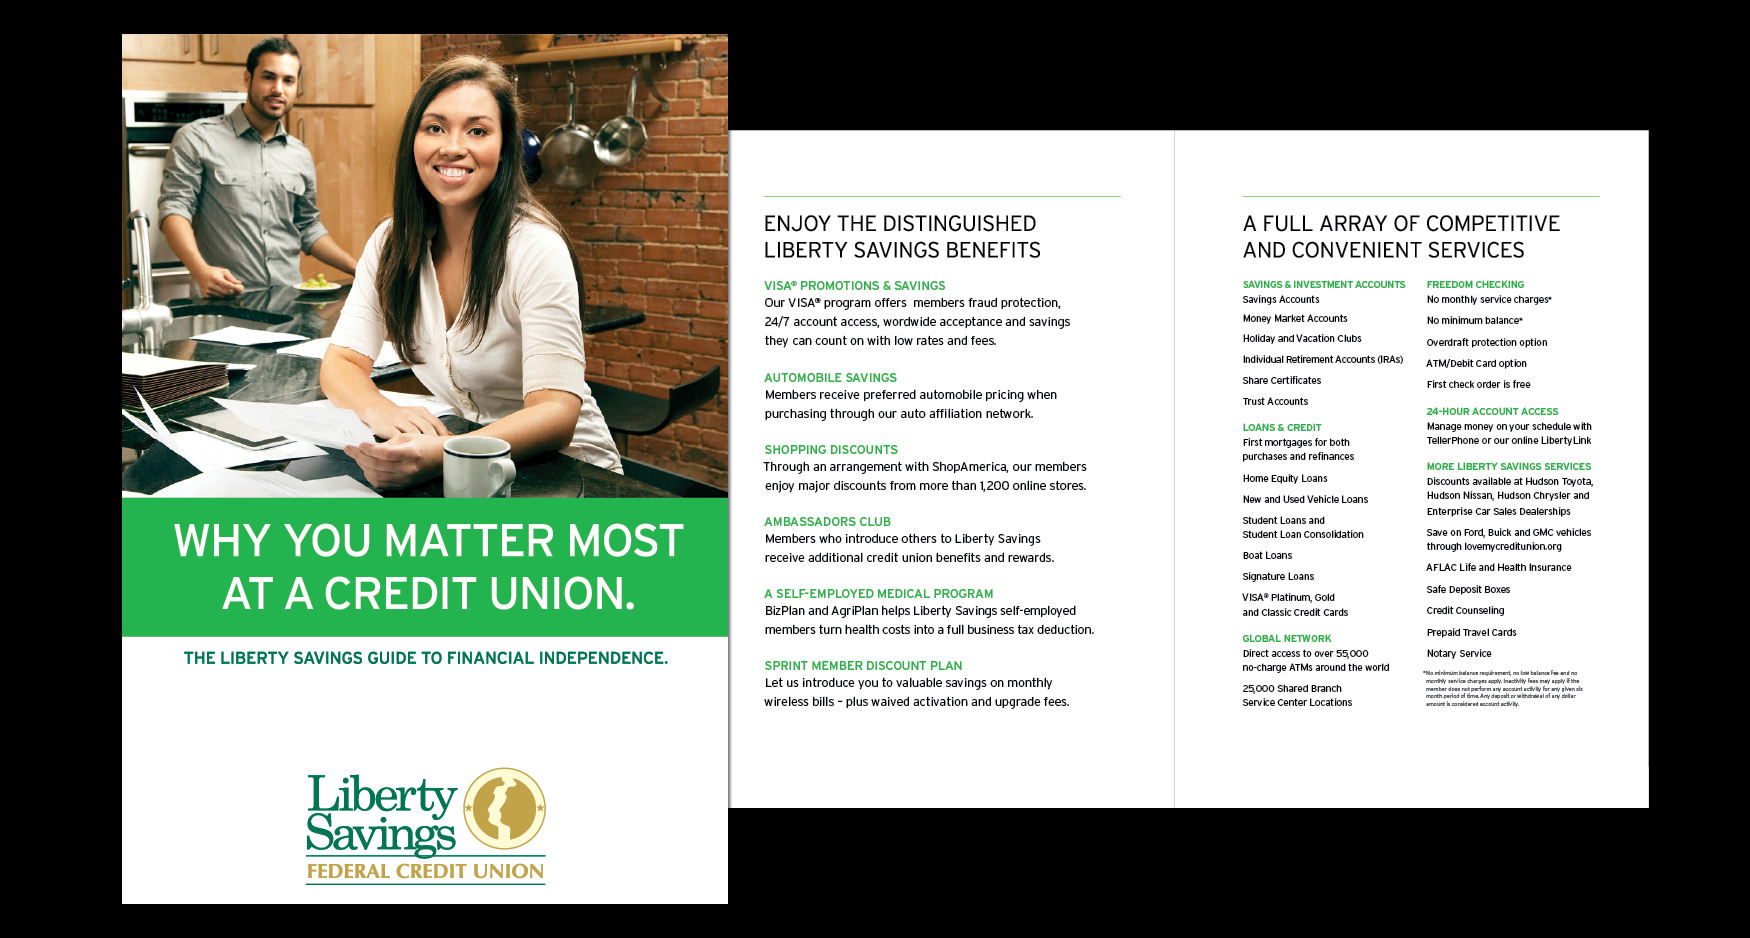 Benefits Brochure1 - LIBERTY SAVINGS - BENEFITS BROCHURE